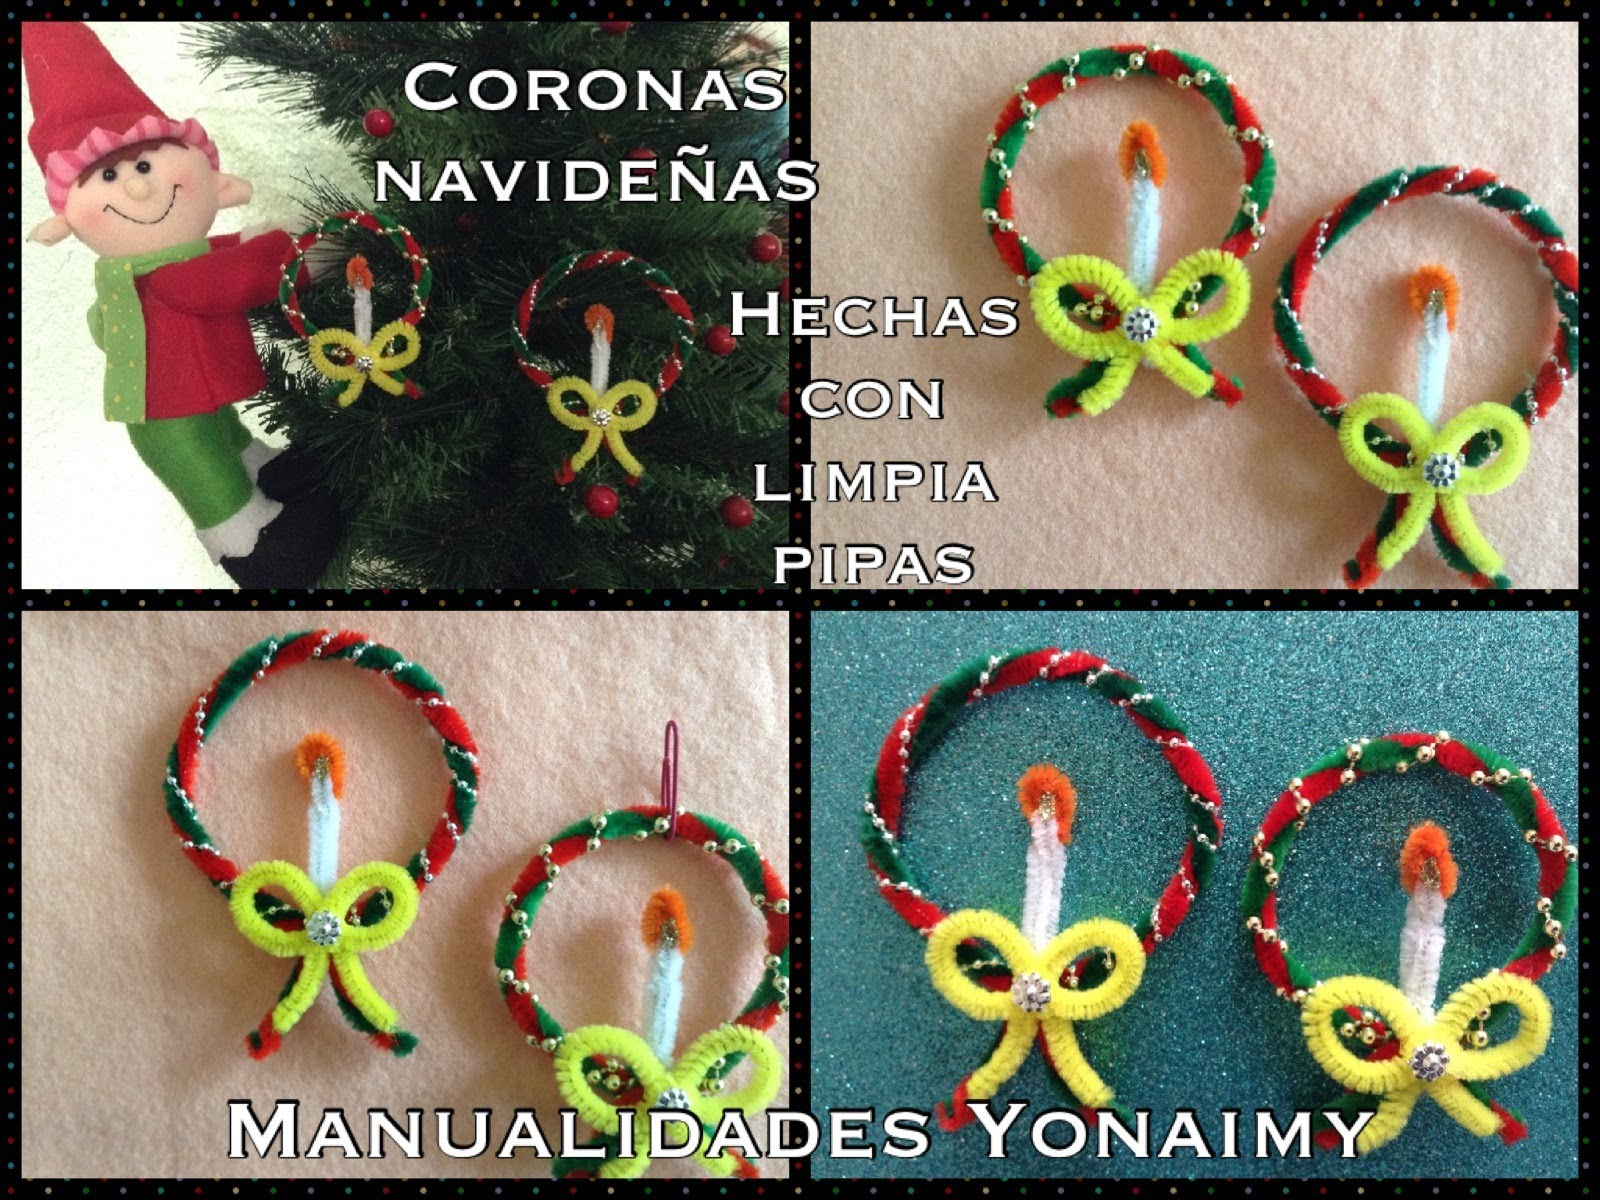 Coronas navide as hechas con limpia pipas playlist - Ideas decoracion navidad manualidades ...